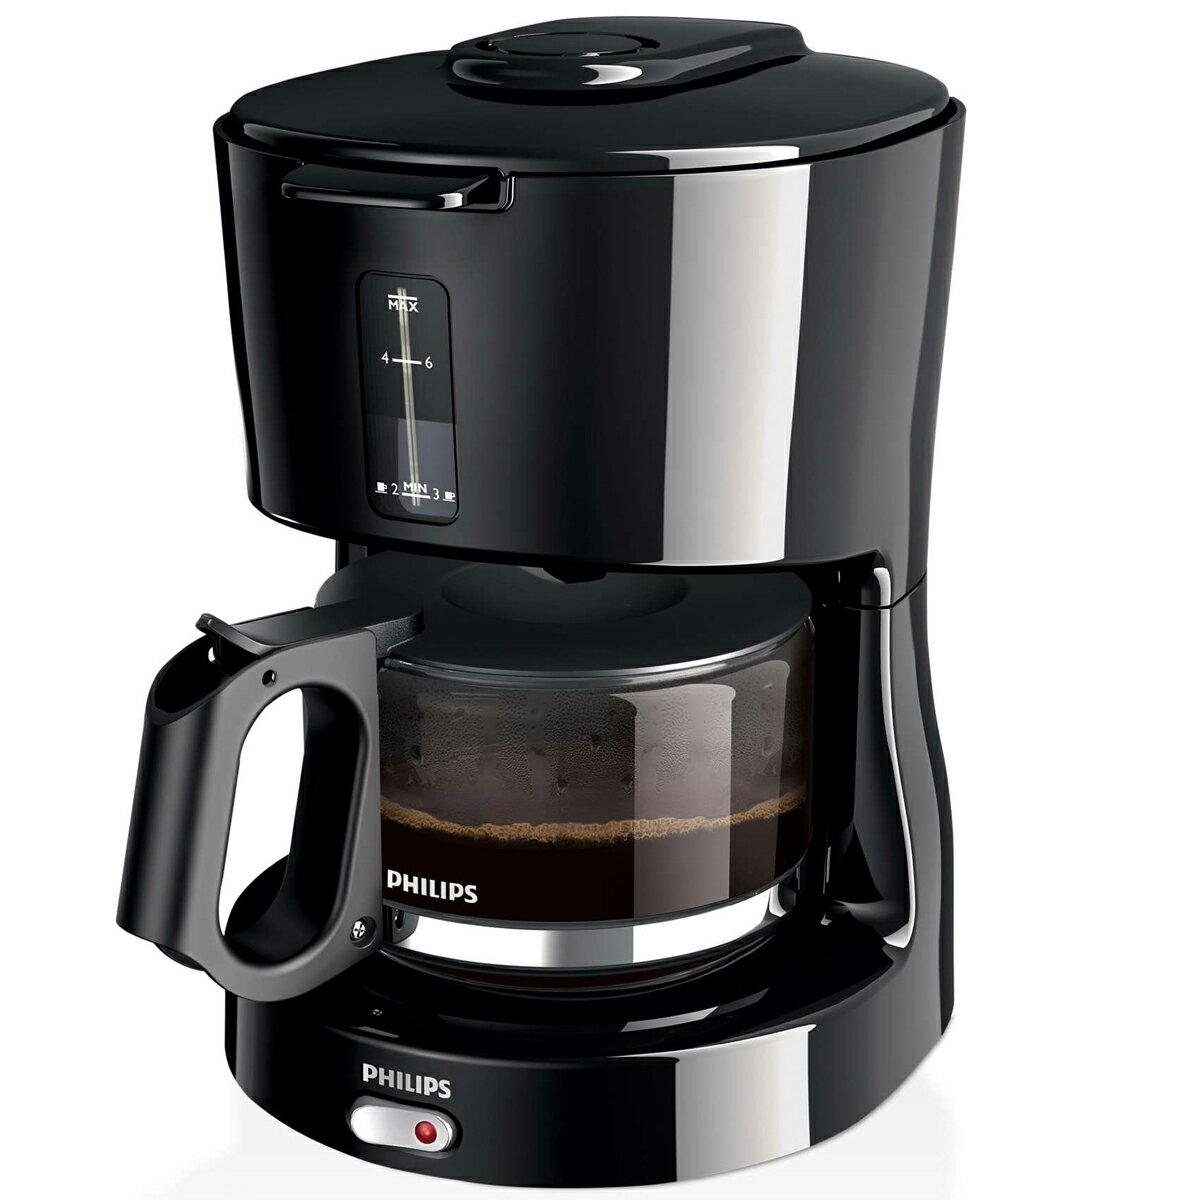 PHILIPS 飛利浦  HD7450/20美式咖啡機 黑 買就送雙層不銹鋼保溫飯盒